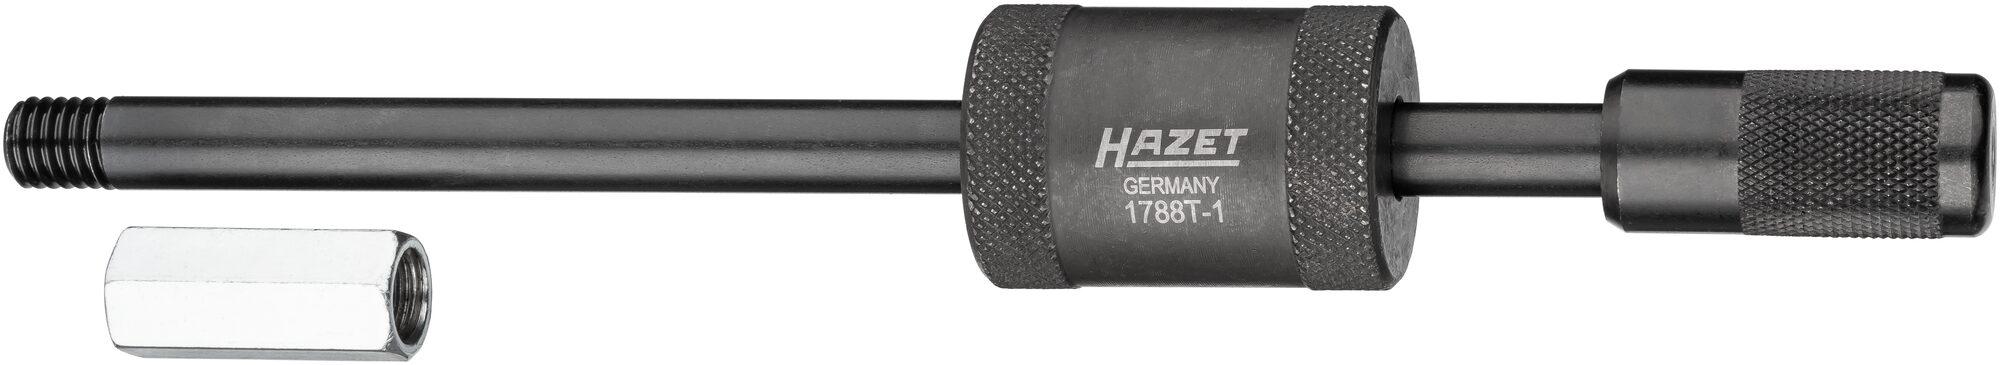 HAZET Schlag-Ausziehgerät 1788T-1